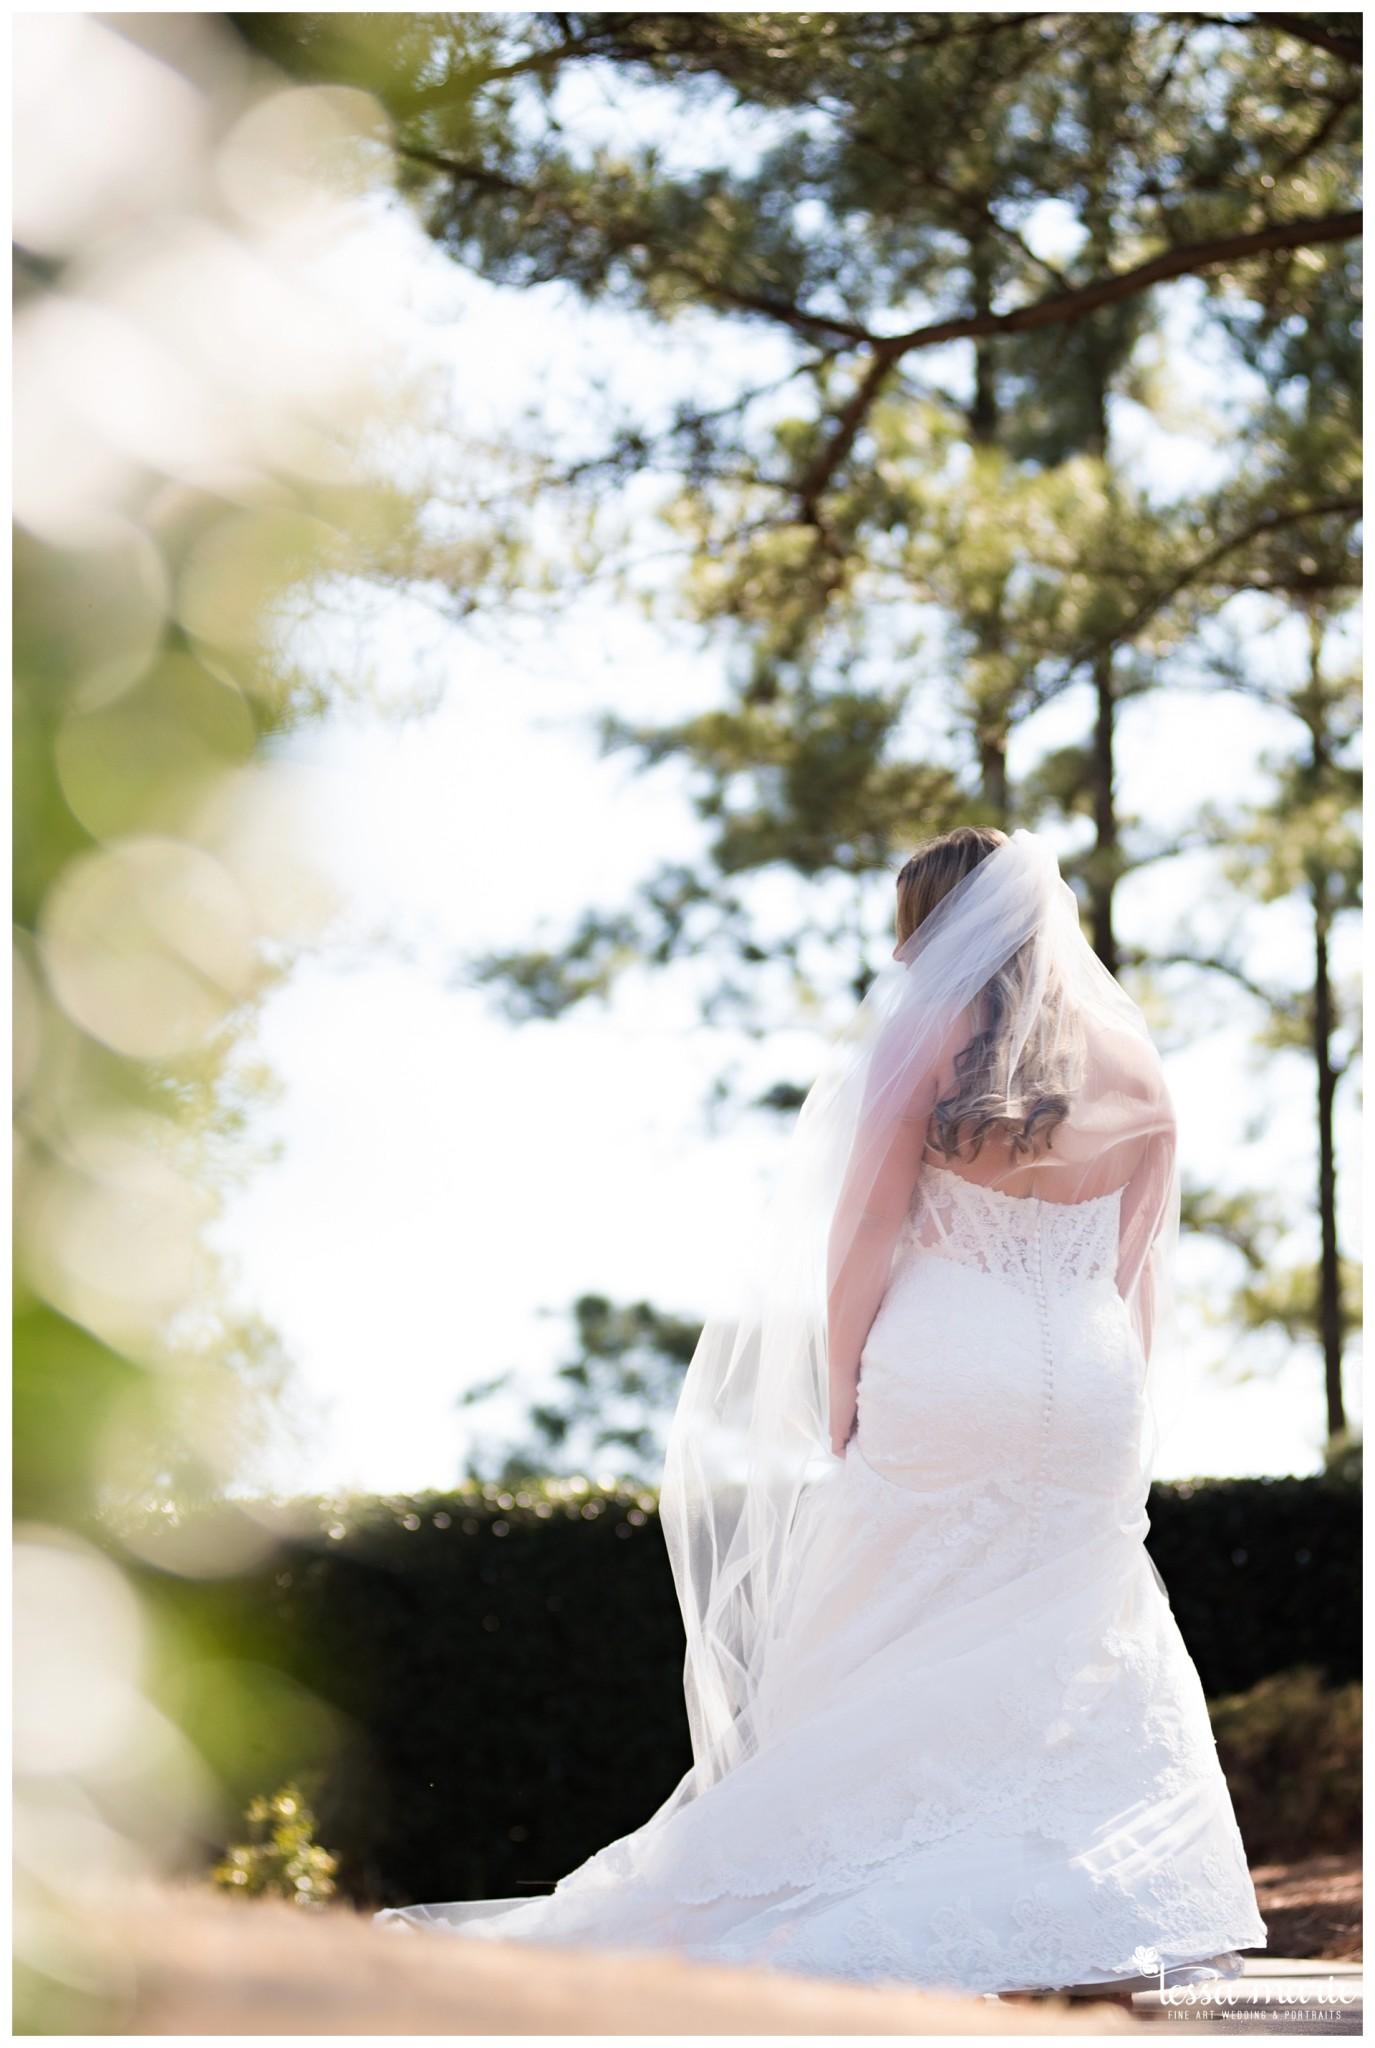 tessa_marie_weddings_legacy_story_focused_wedding_pictures_atlanta_wedding_photographer_0082